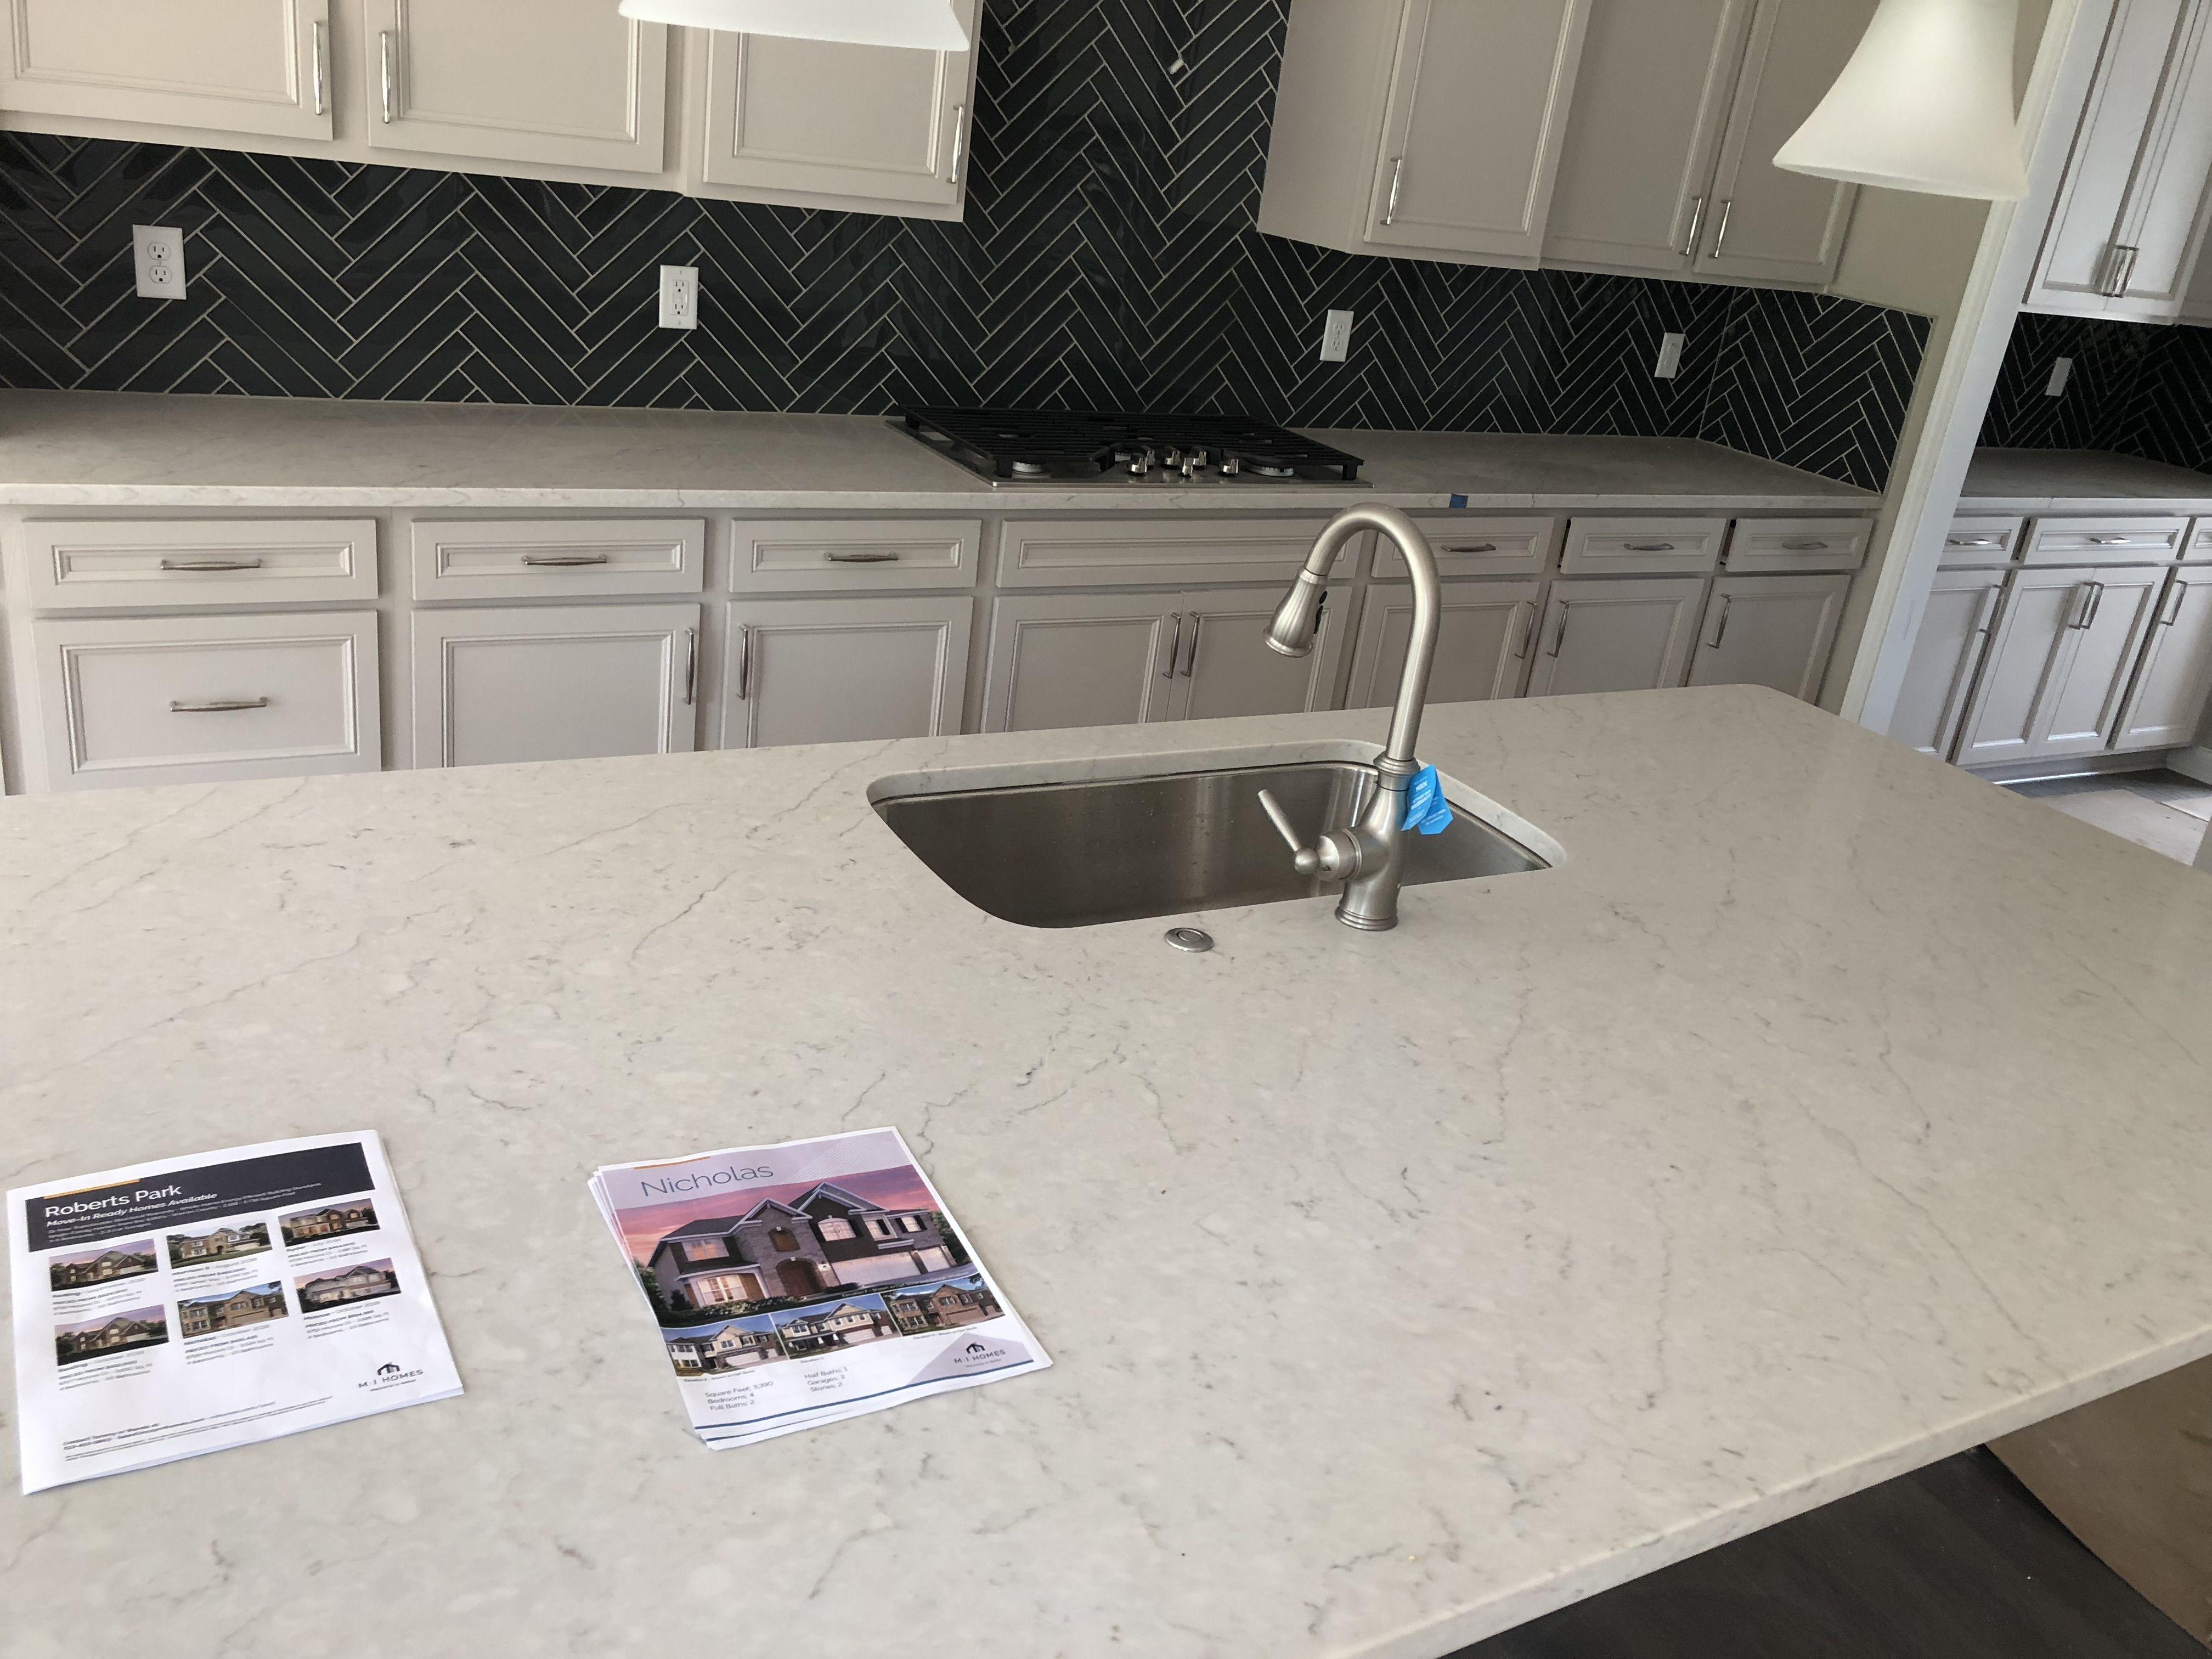 Carrara Caldia Quartz Updated Kitchen Kitchen Redo Countertop Backsplash